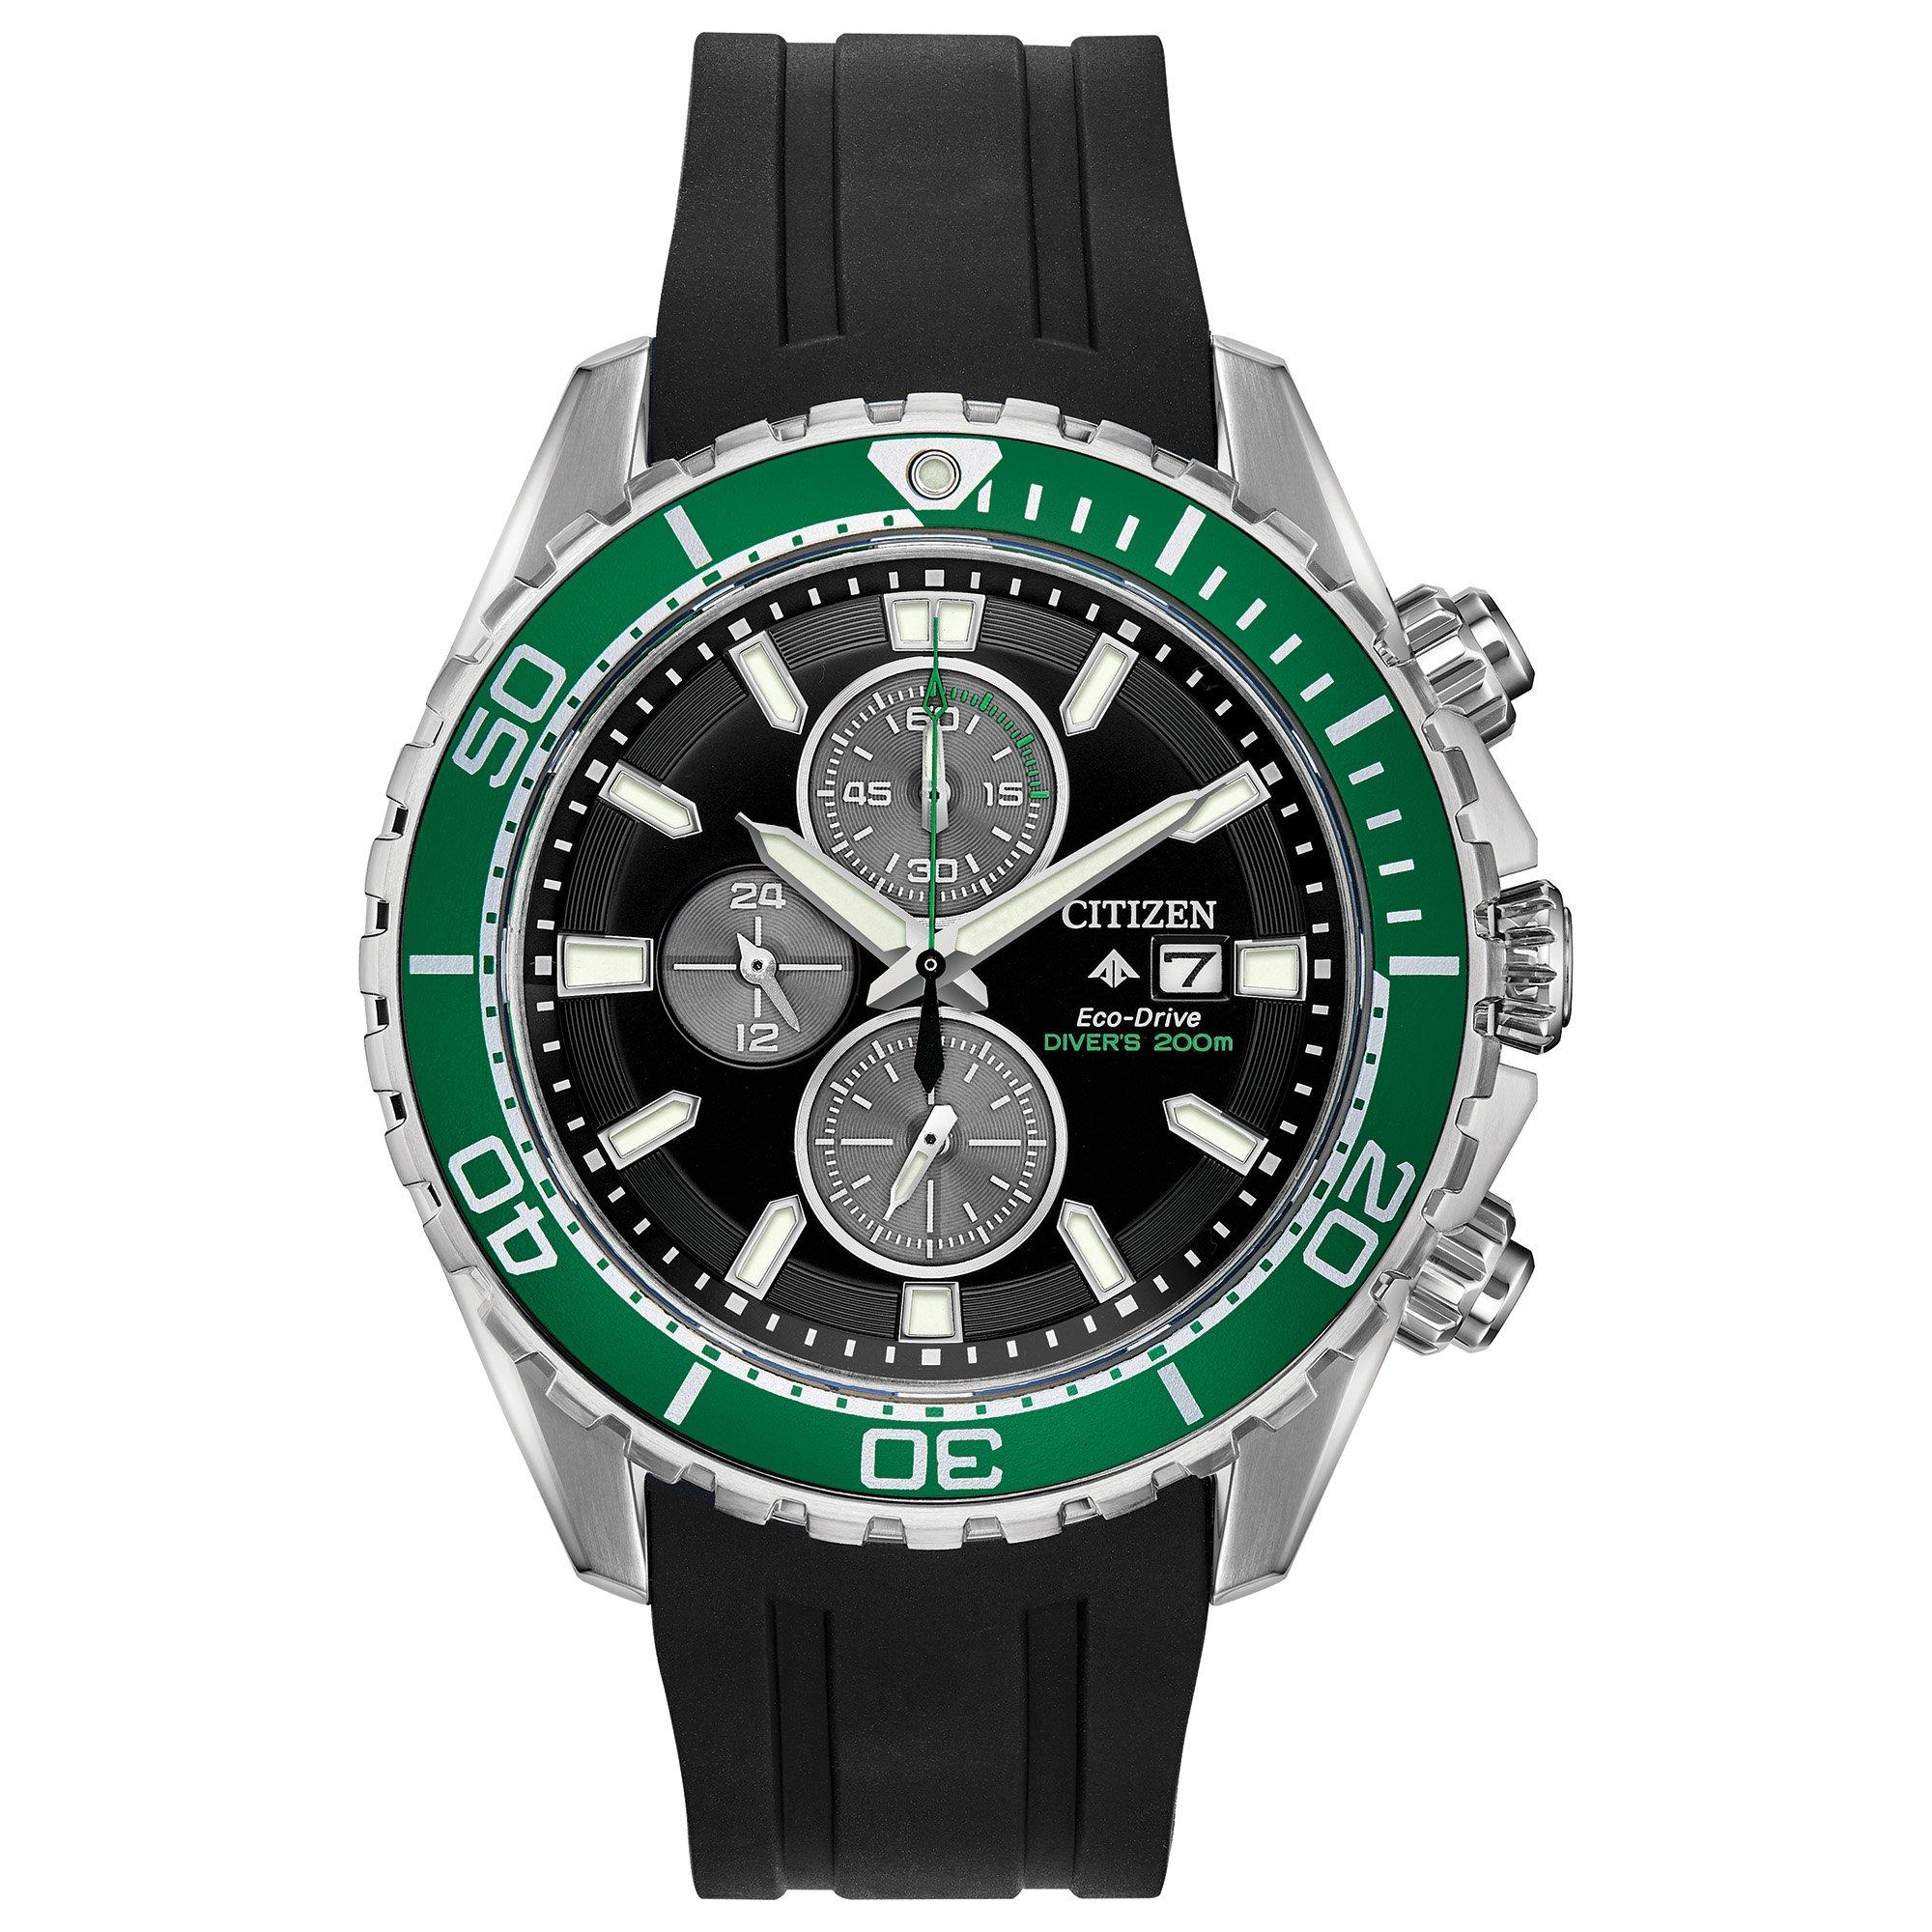 Citizen Promaster Diver Chronograph Men's Watch